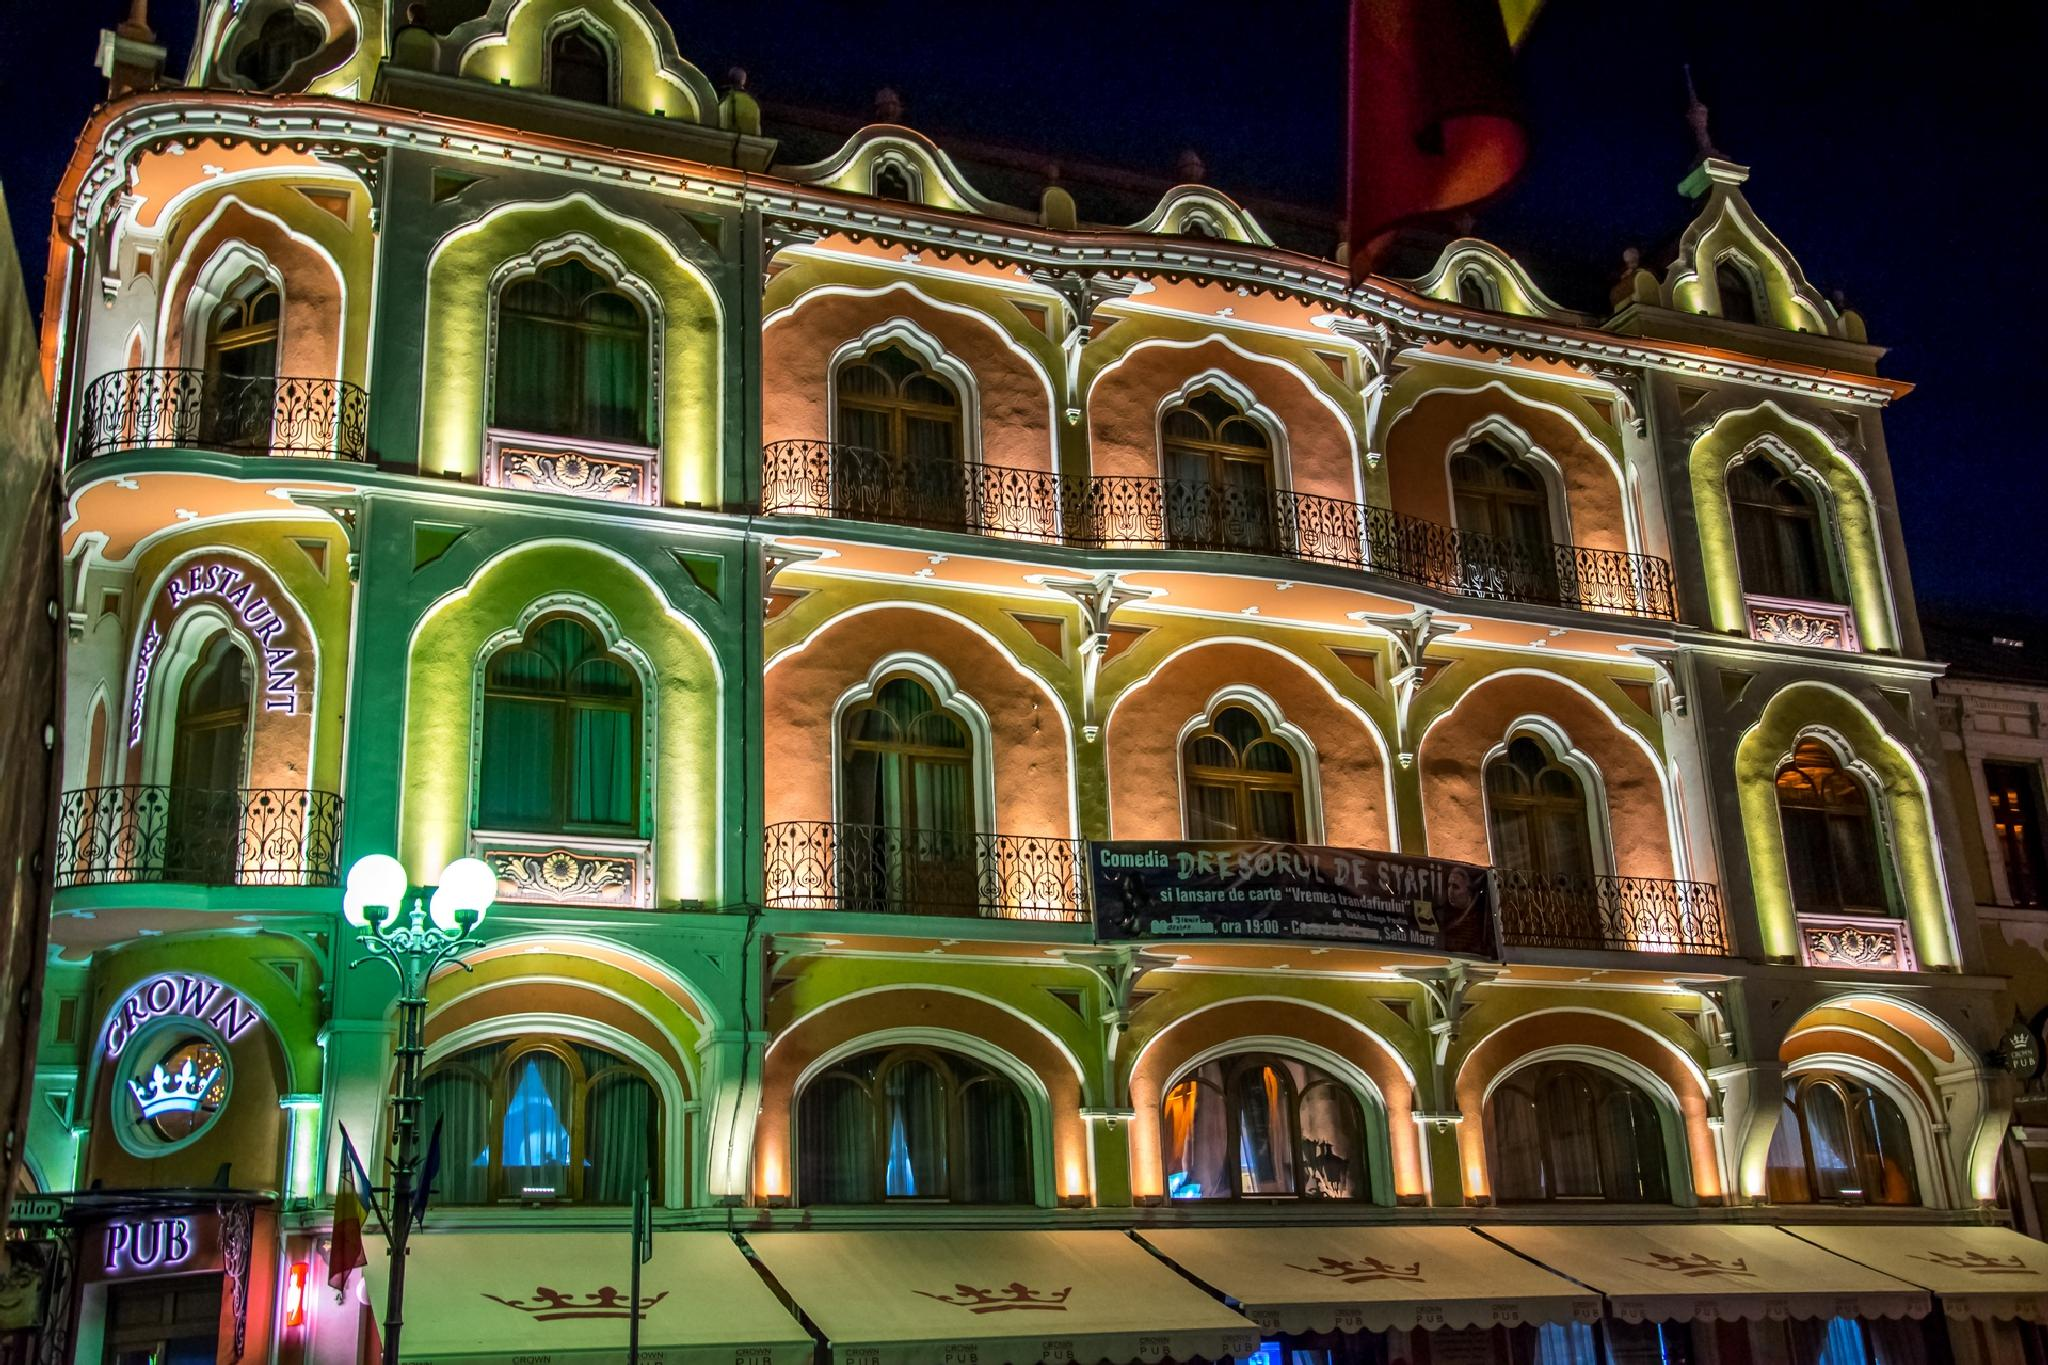 Crown Pub - Oradea night by Firefly8